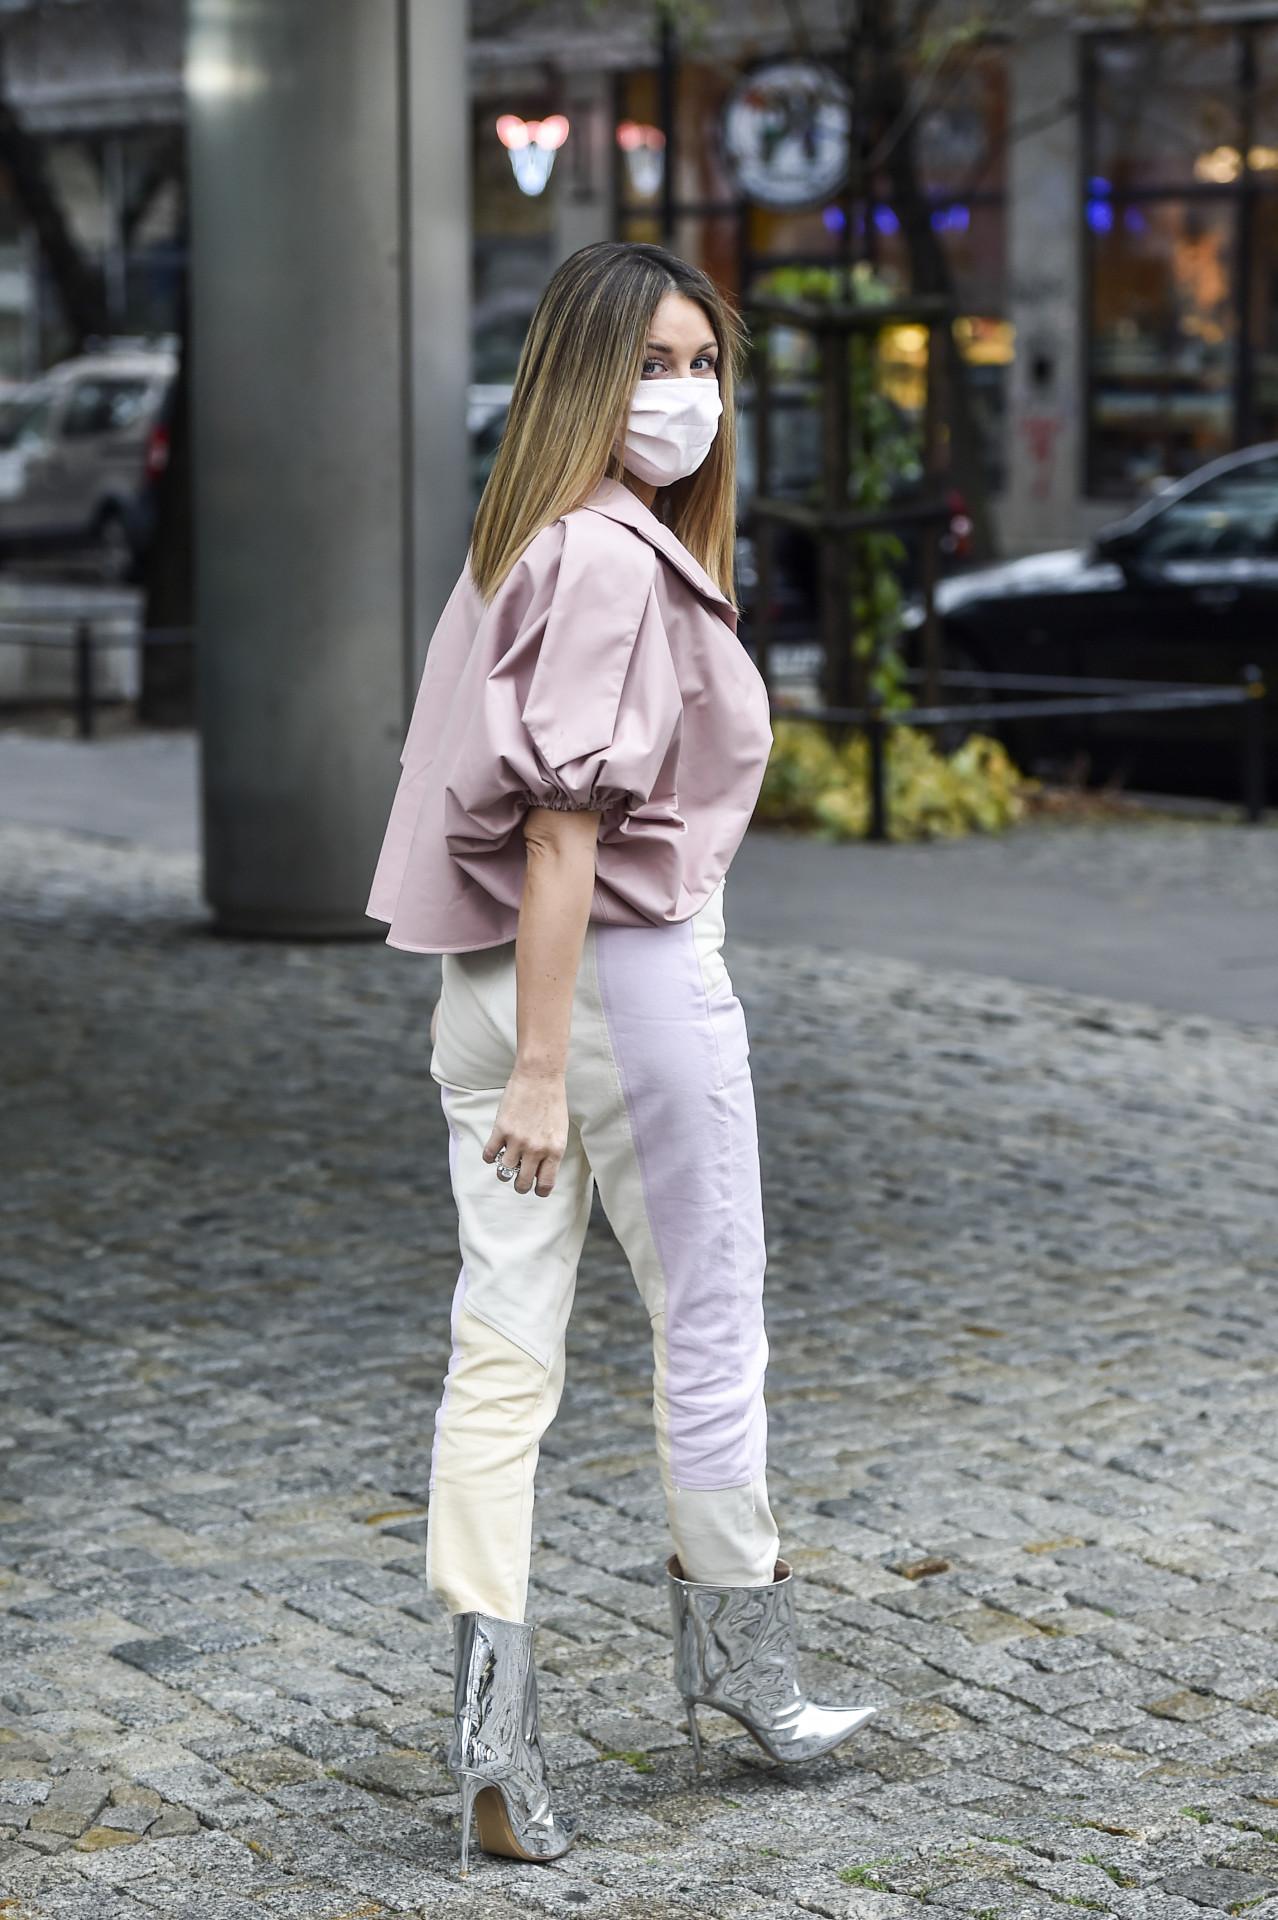 Różowa Małgrzata Rozenek, fot. AKPA